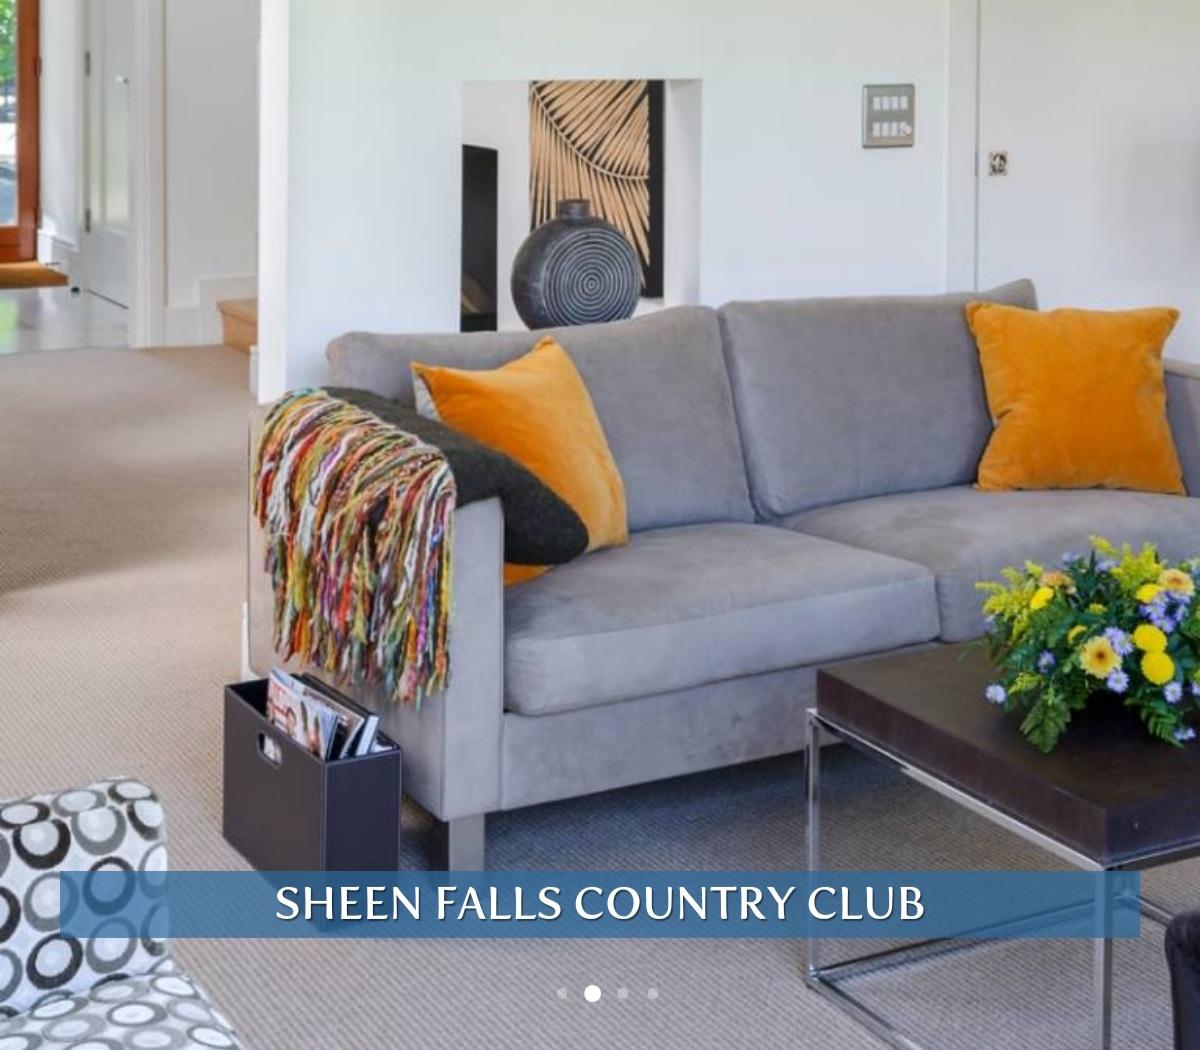 Sheen Falls Country Club Homepage